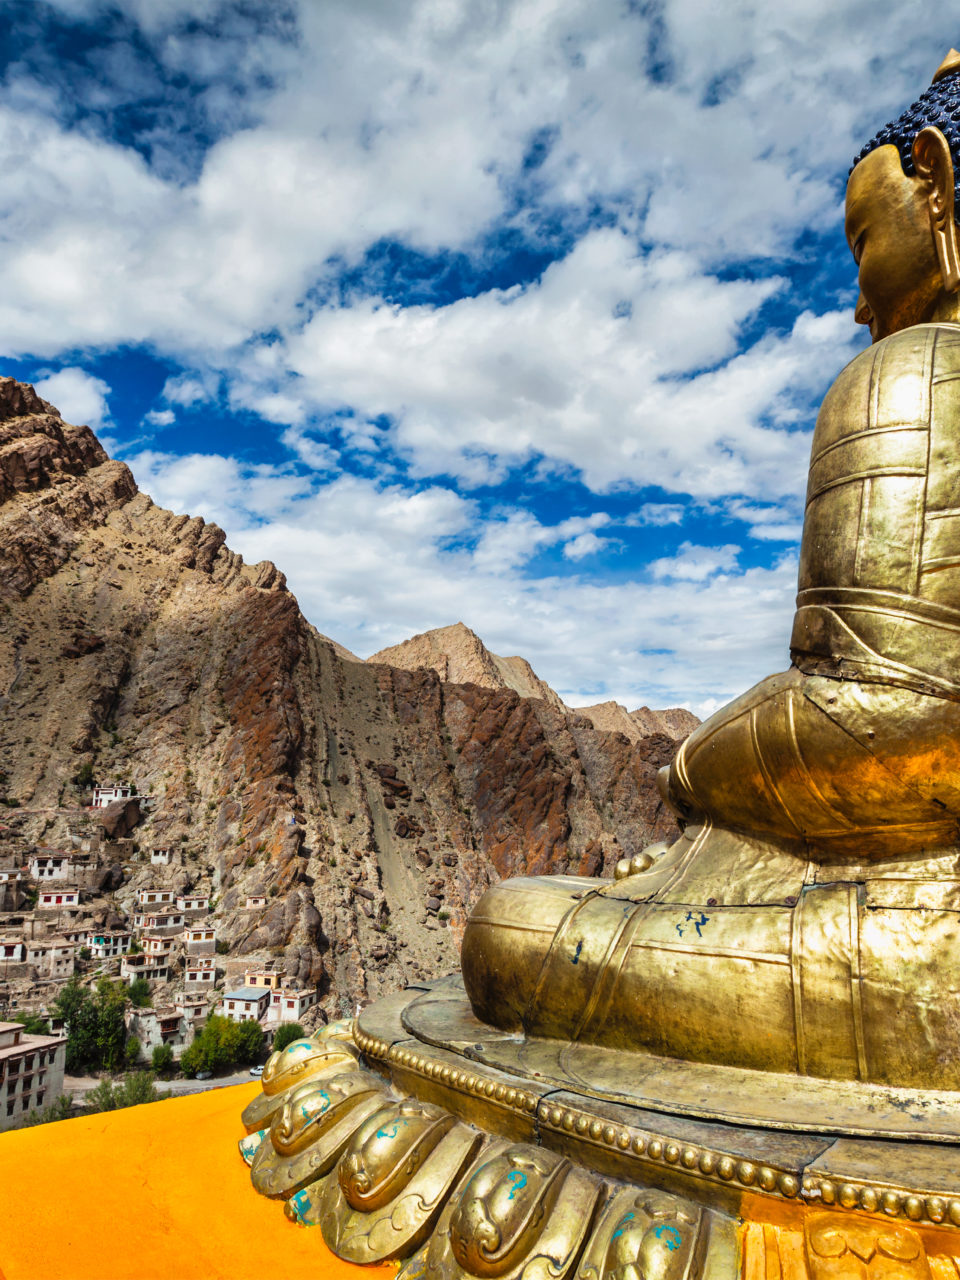 https://www.planetavenue.com/wp-content/uploads/2020/12/buddha-statue-and-hemis-monastery-ladakh-PKG4SG9-960x1280.jpg